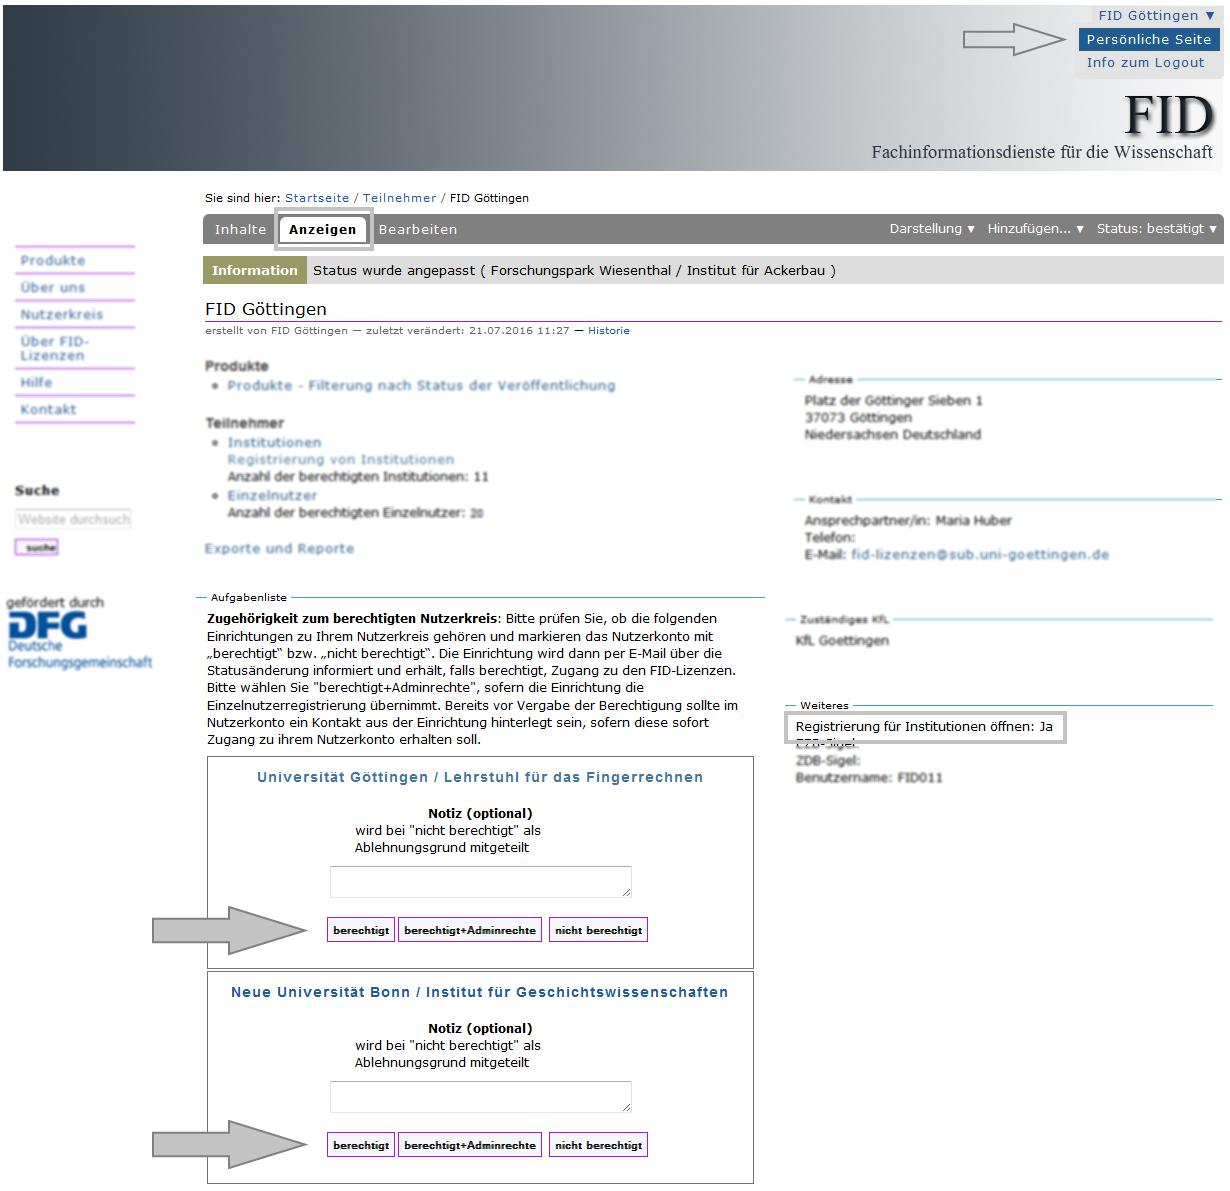 FID - Aufgabenliste